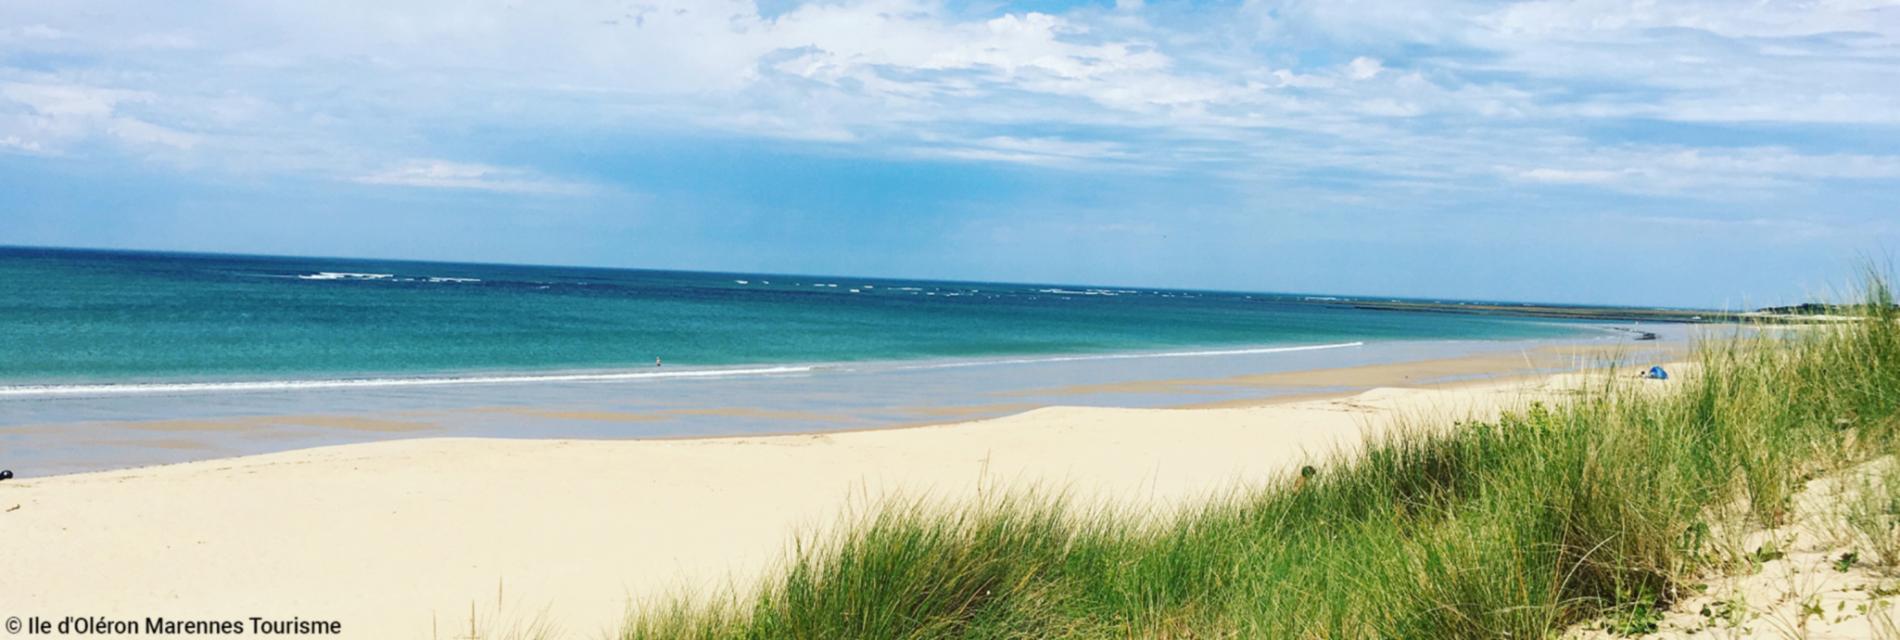 Slide la plage